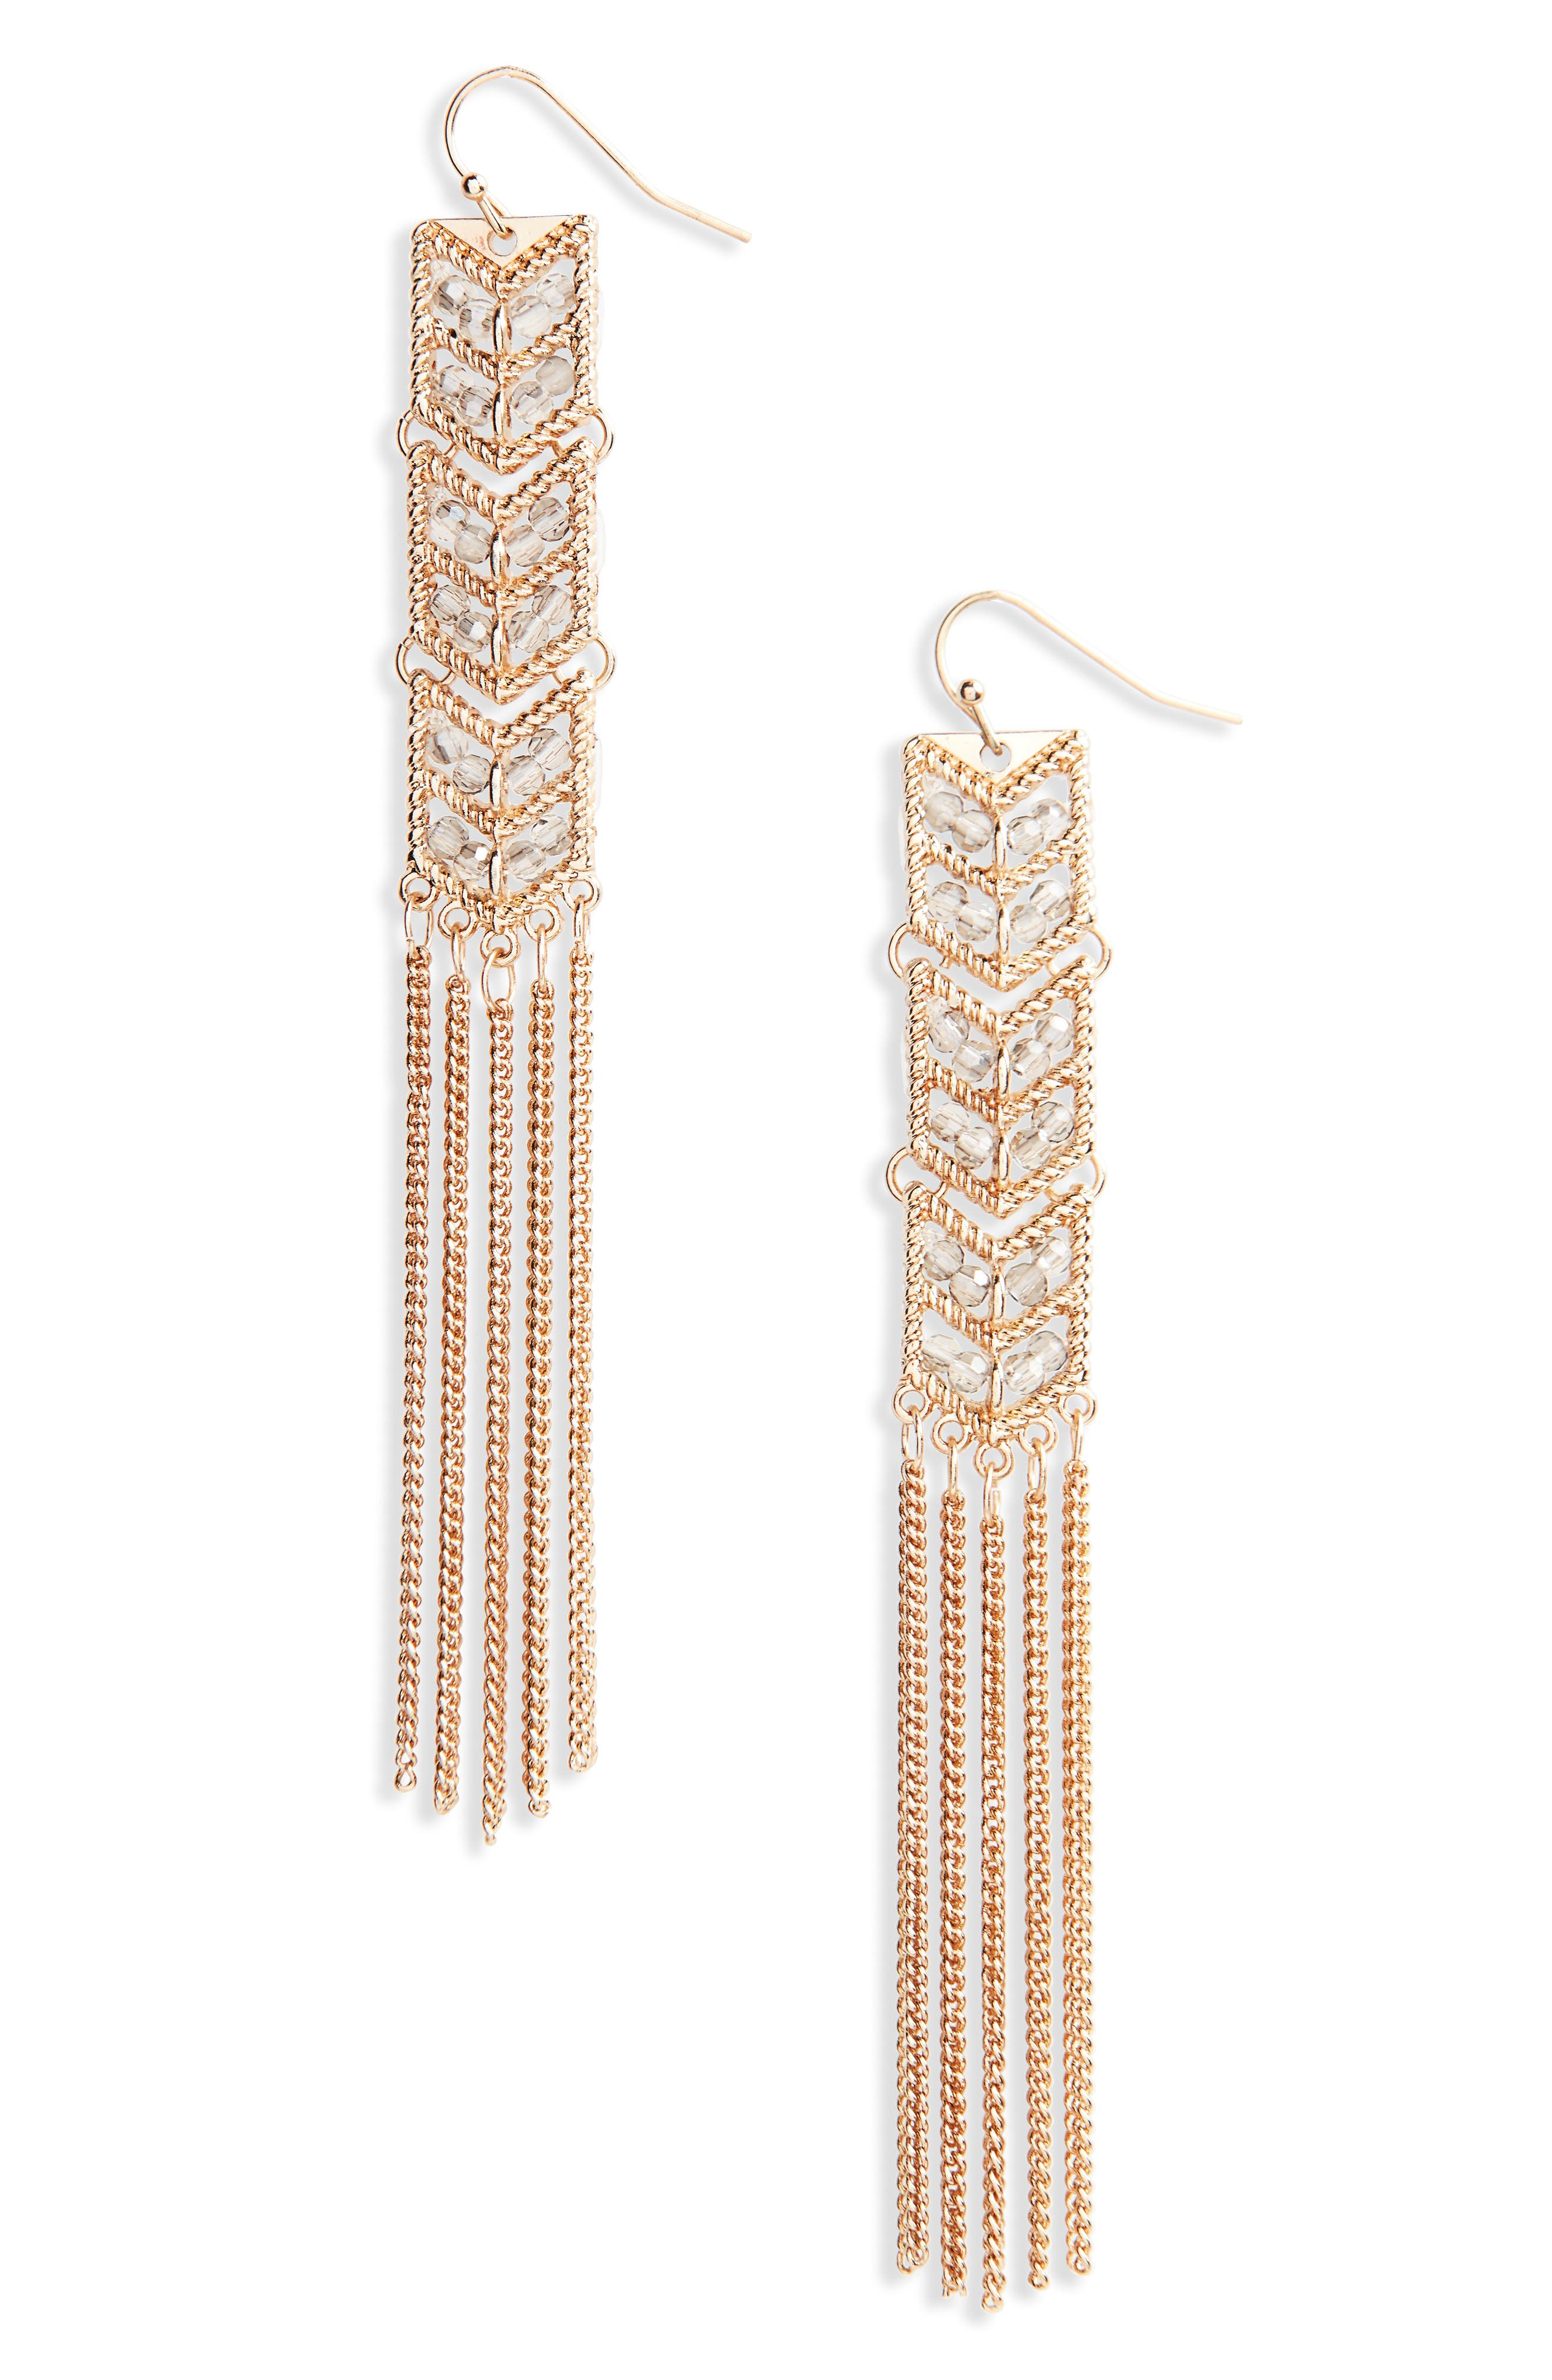 Tassel Earrings,                             Main thumbnail 1, color,                             710